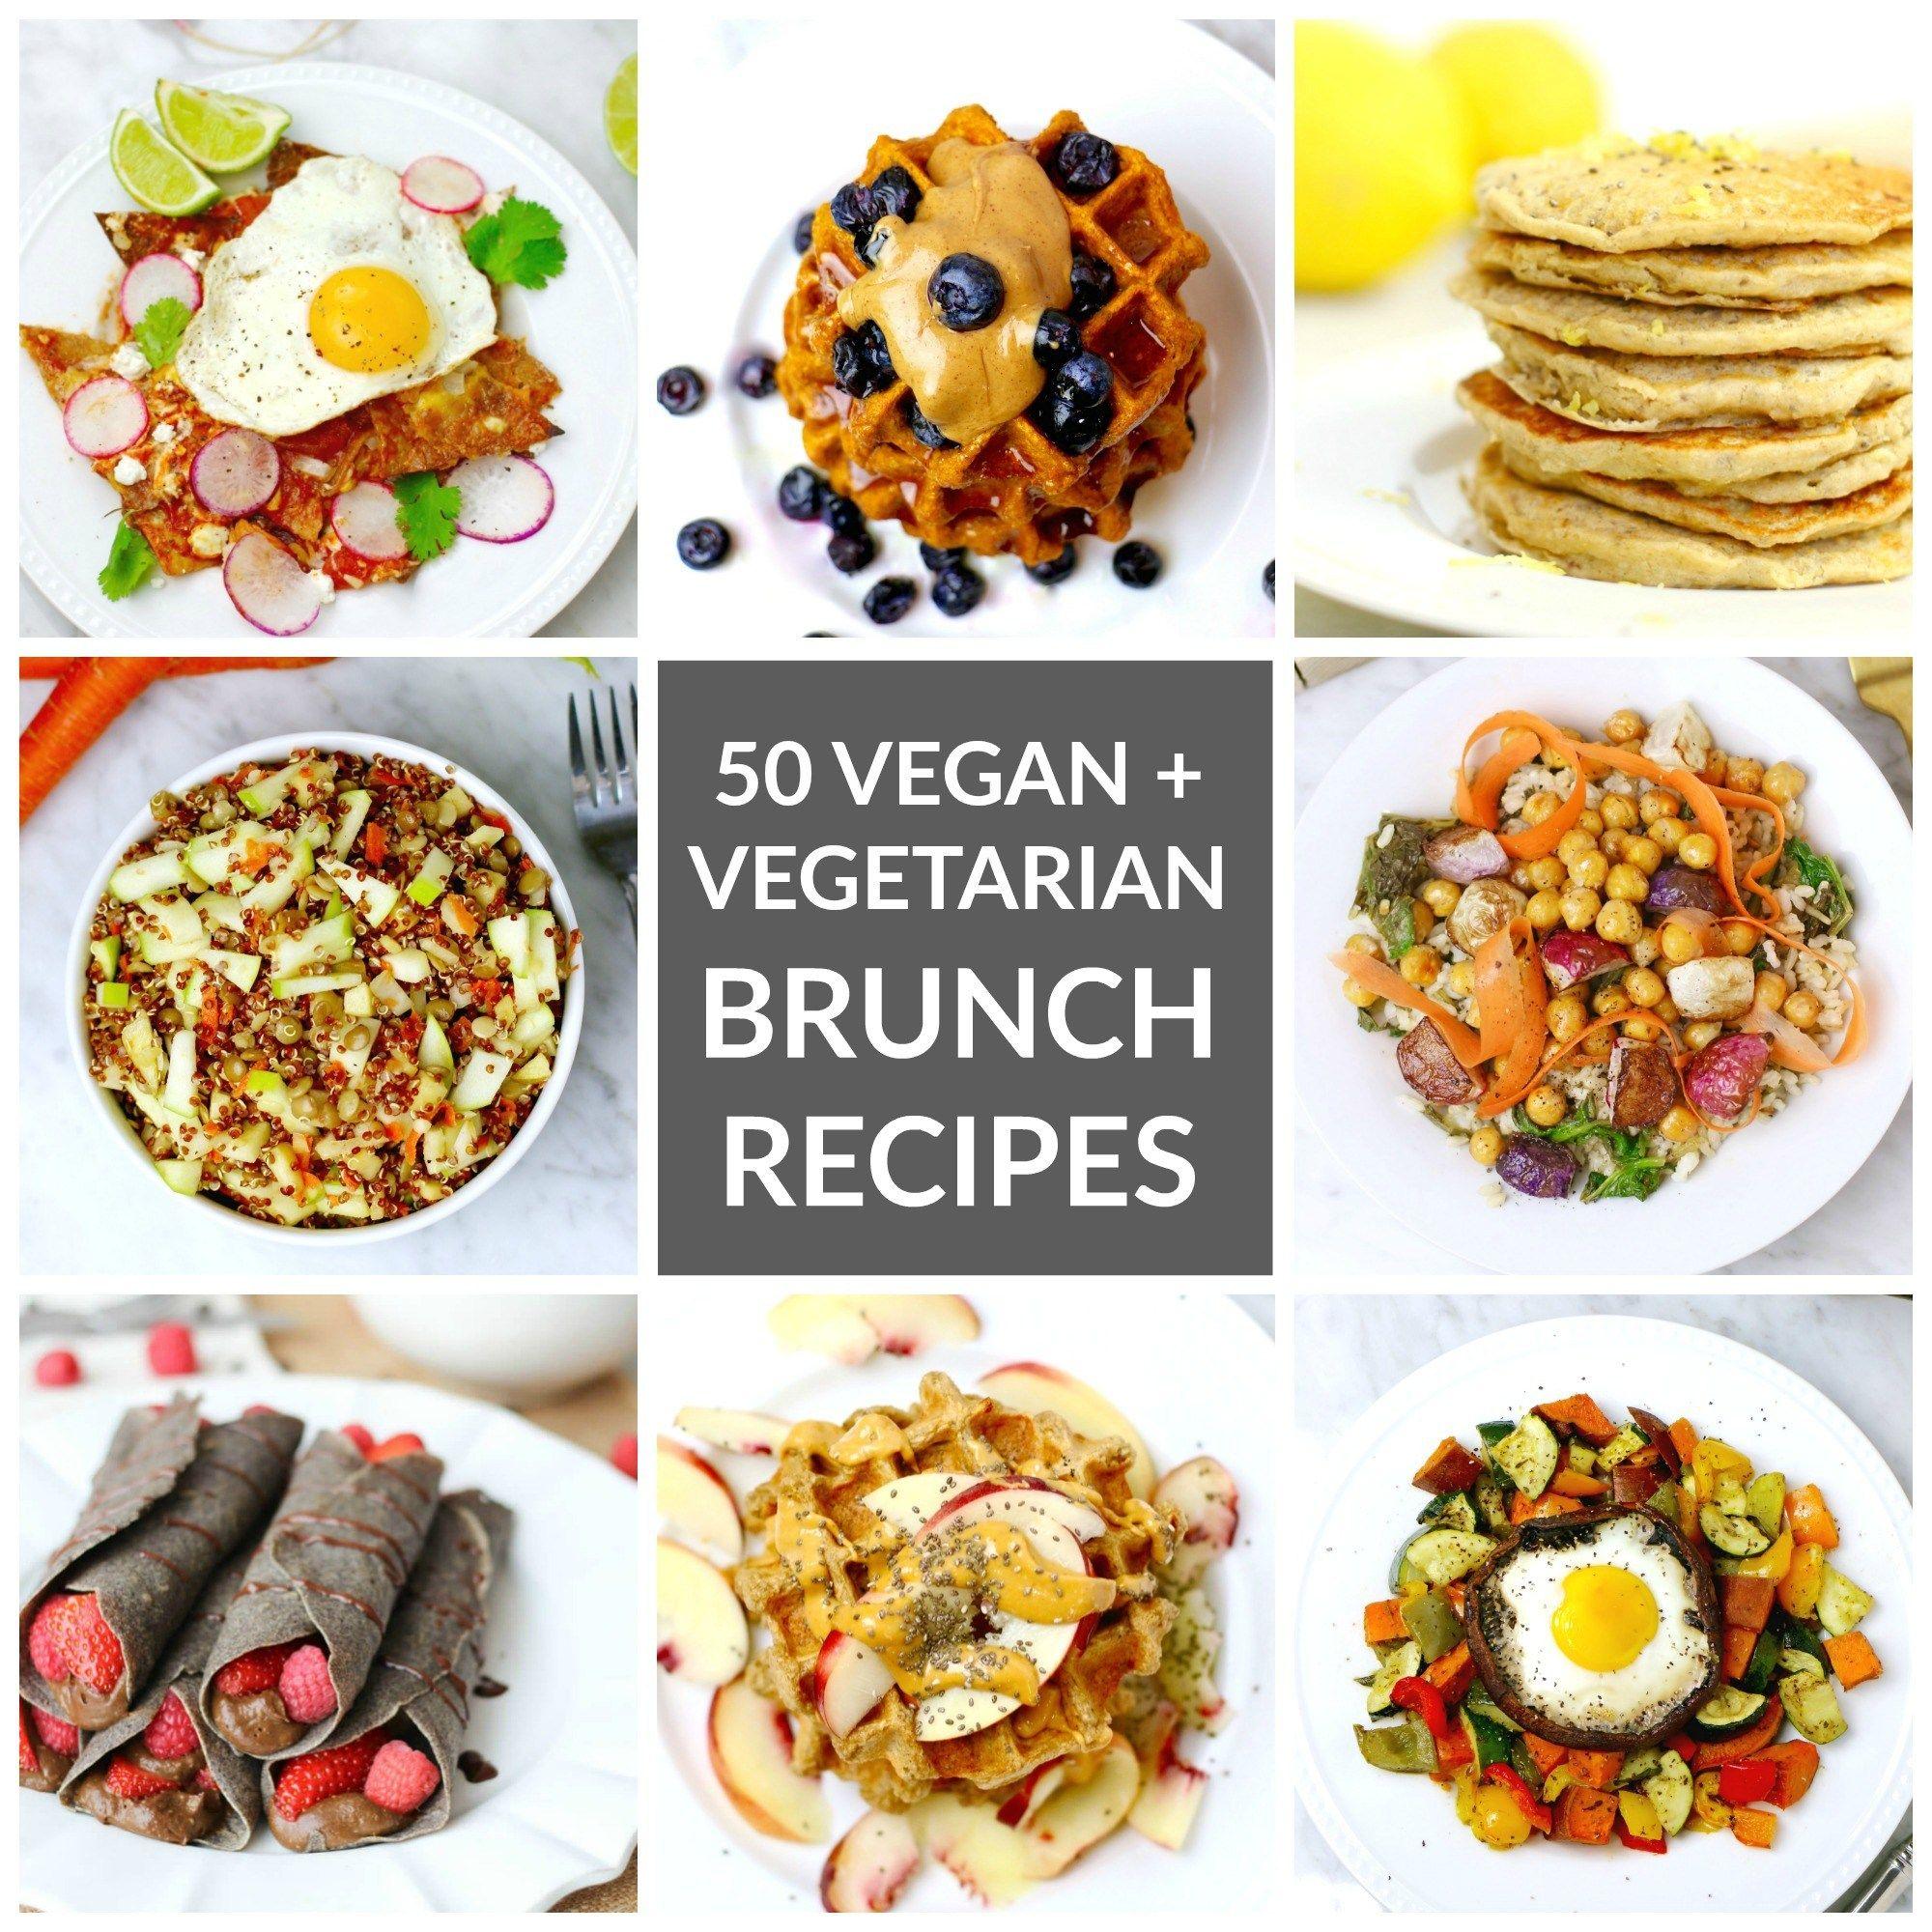 Vegetarian And Vegan Mother S Day Brunch Recipes Brunch Recipes Vegan Brunch Recipes Recipes